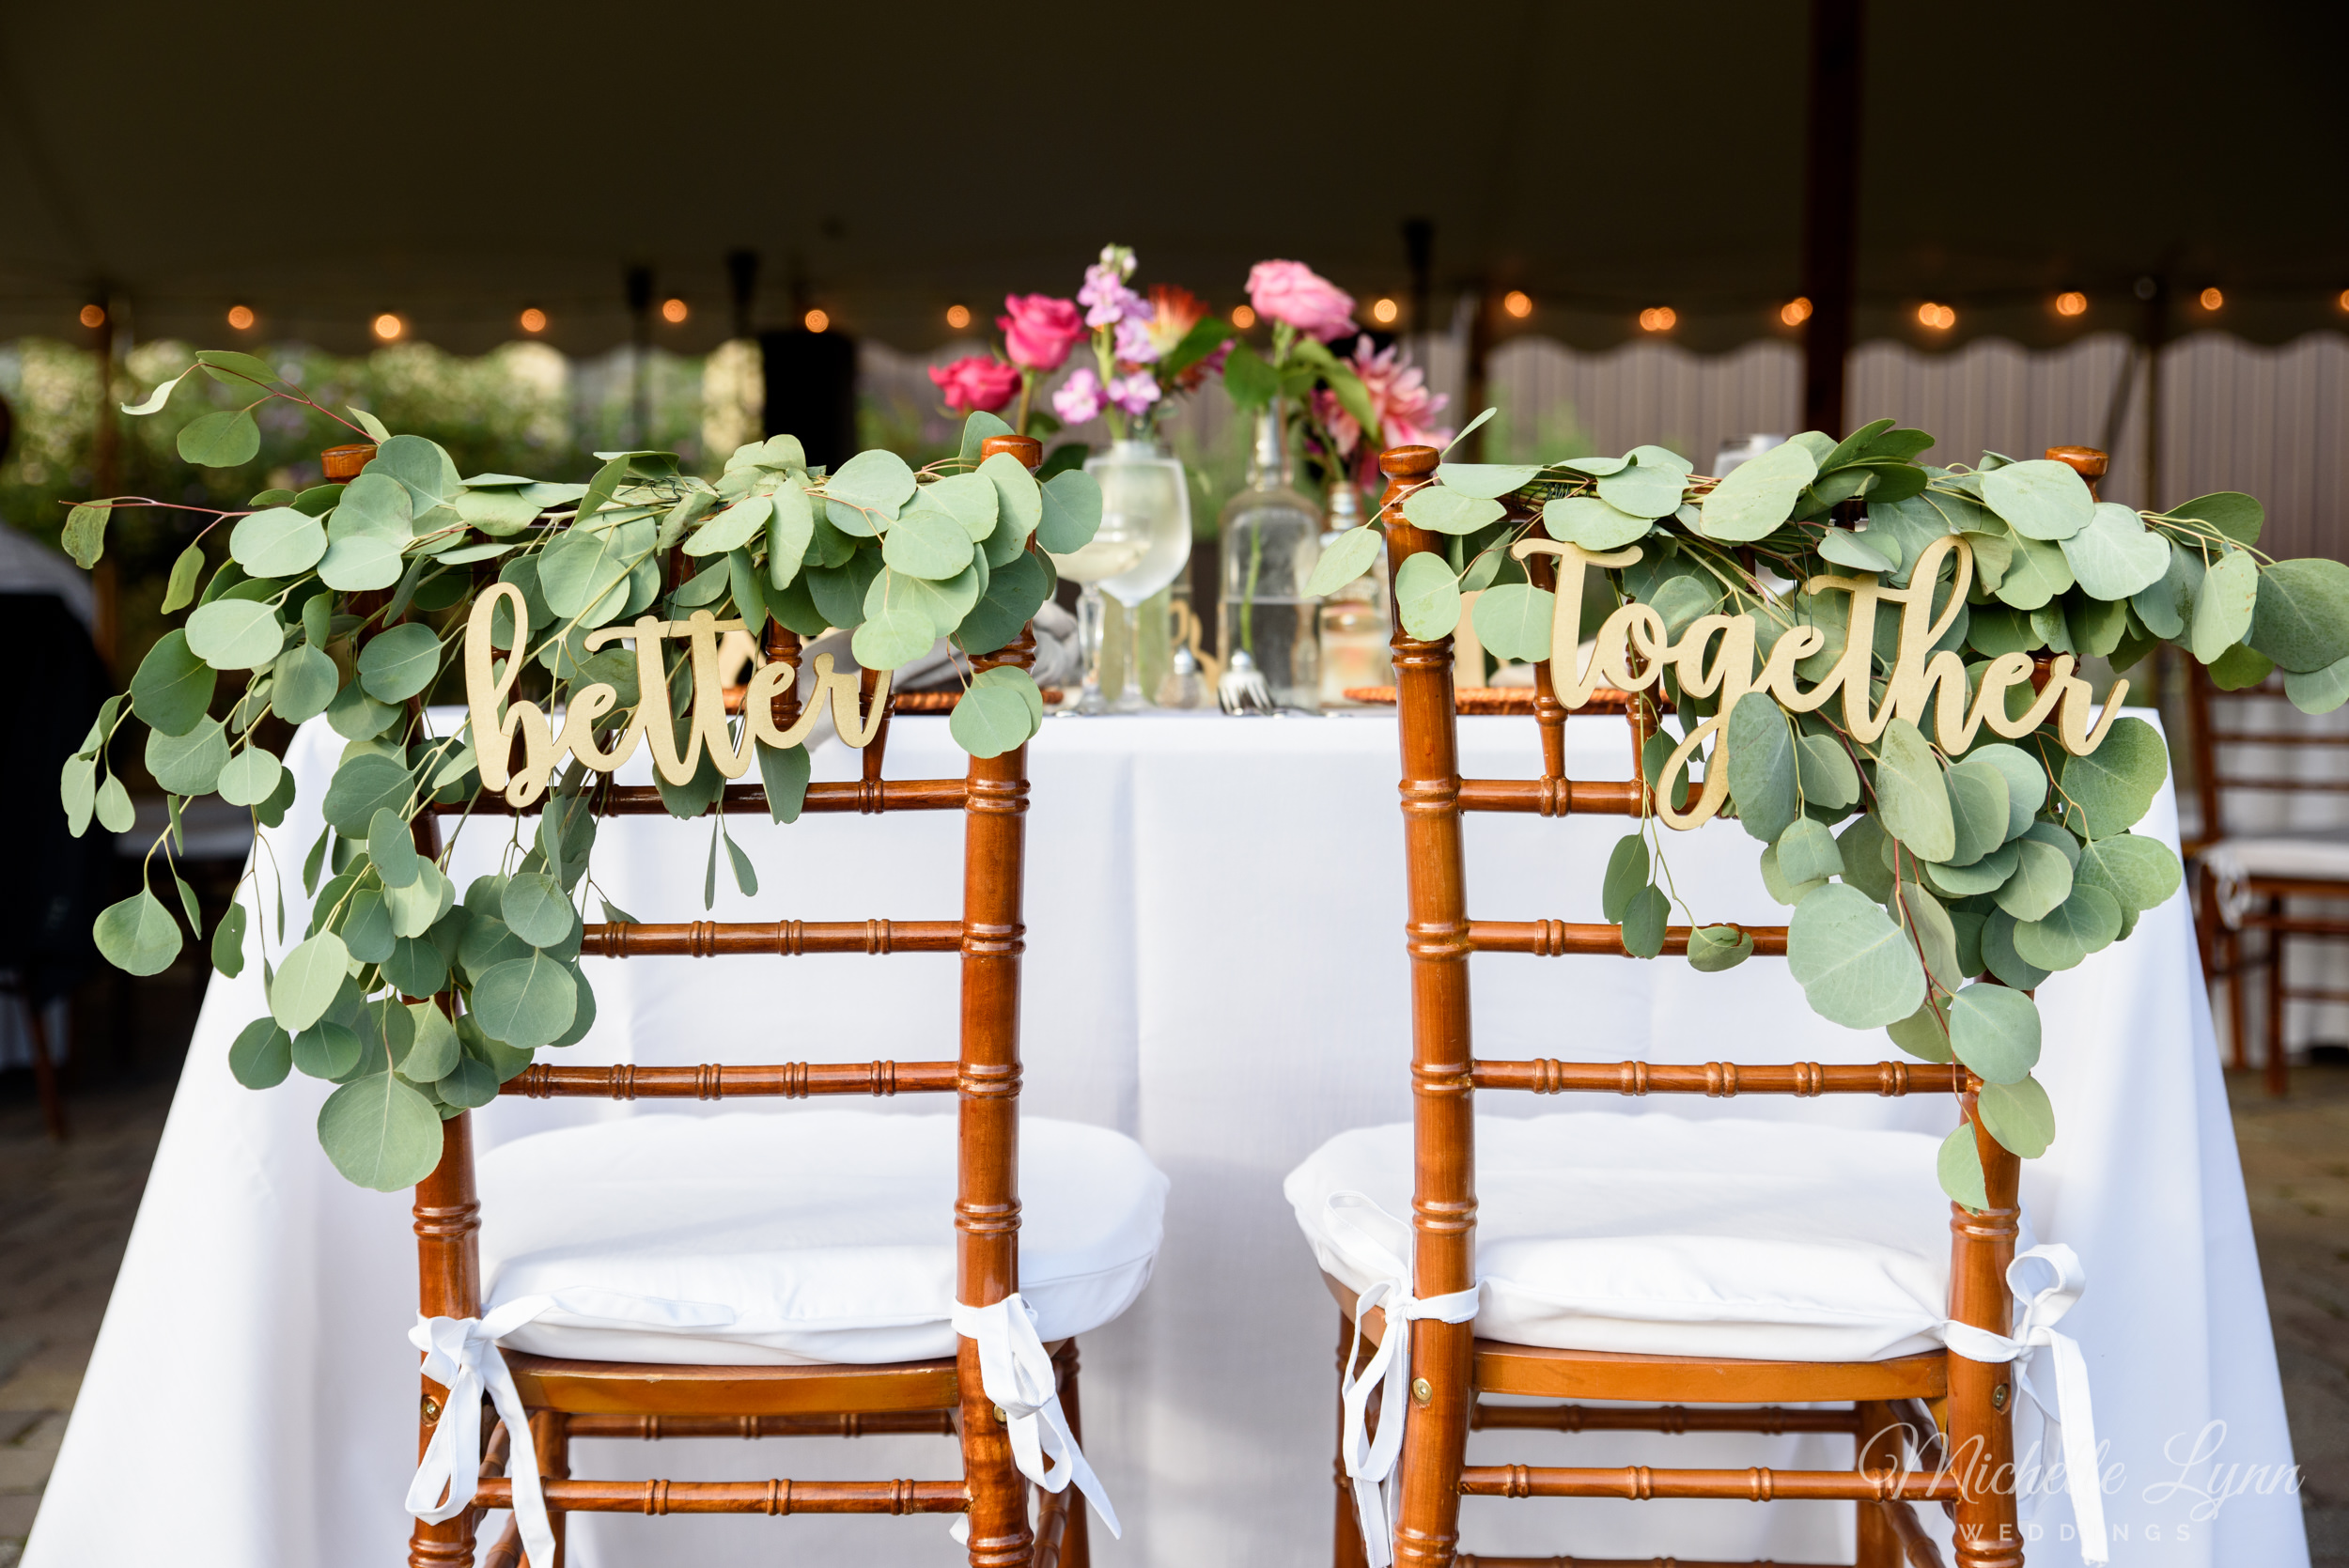 mlw-unionville-vineyards-nj-wedding-photography-73.jpg